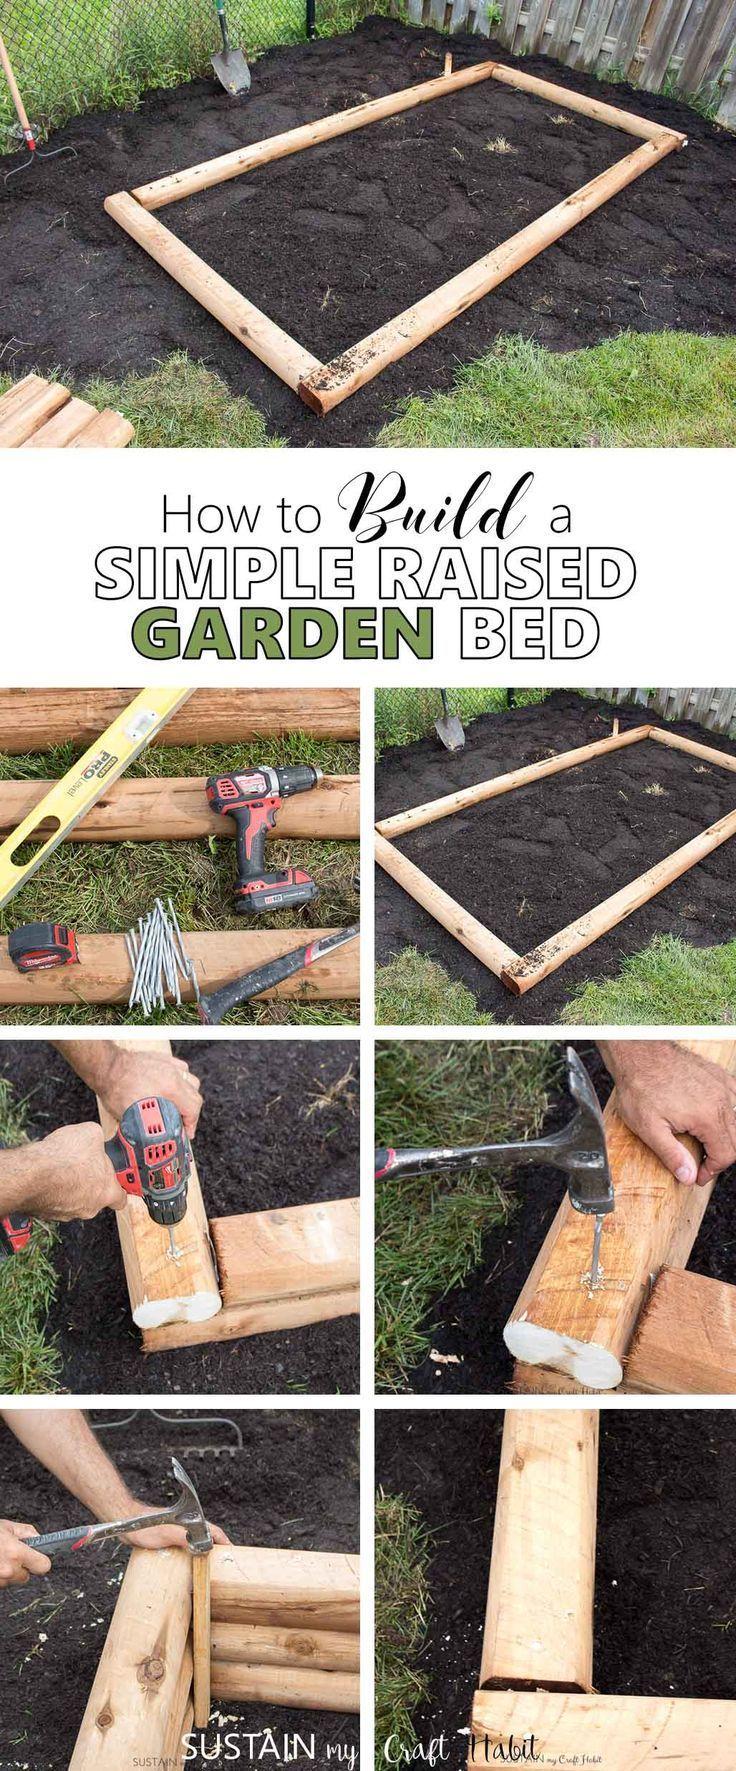 Diy raised garden bed diy u home improvement projects pinterest